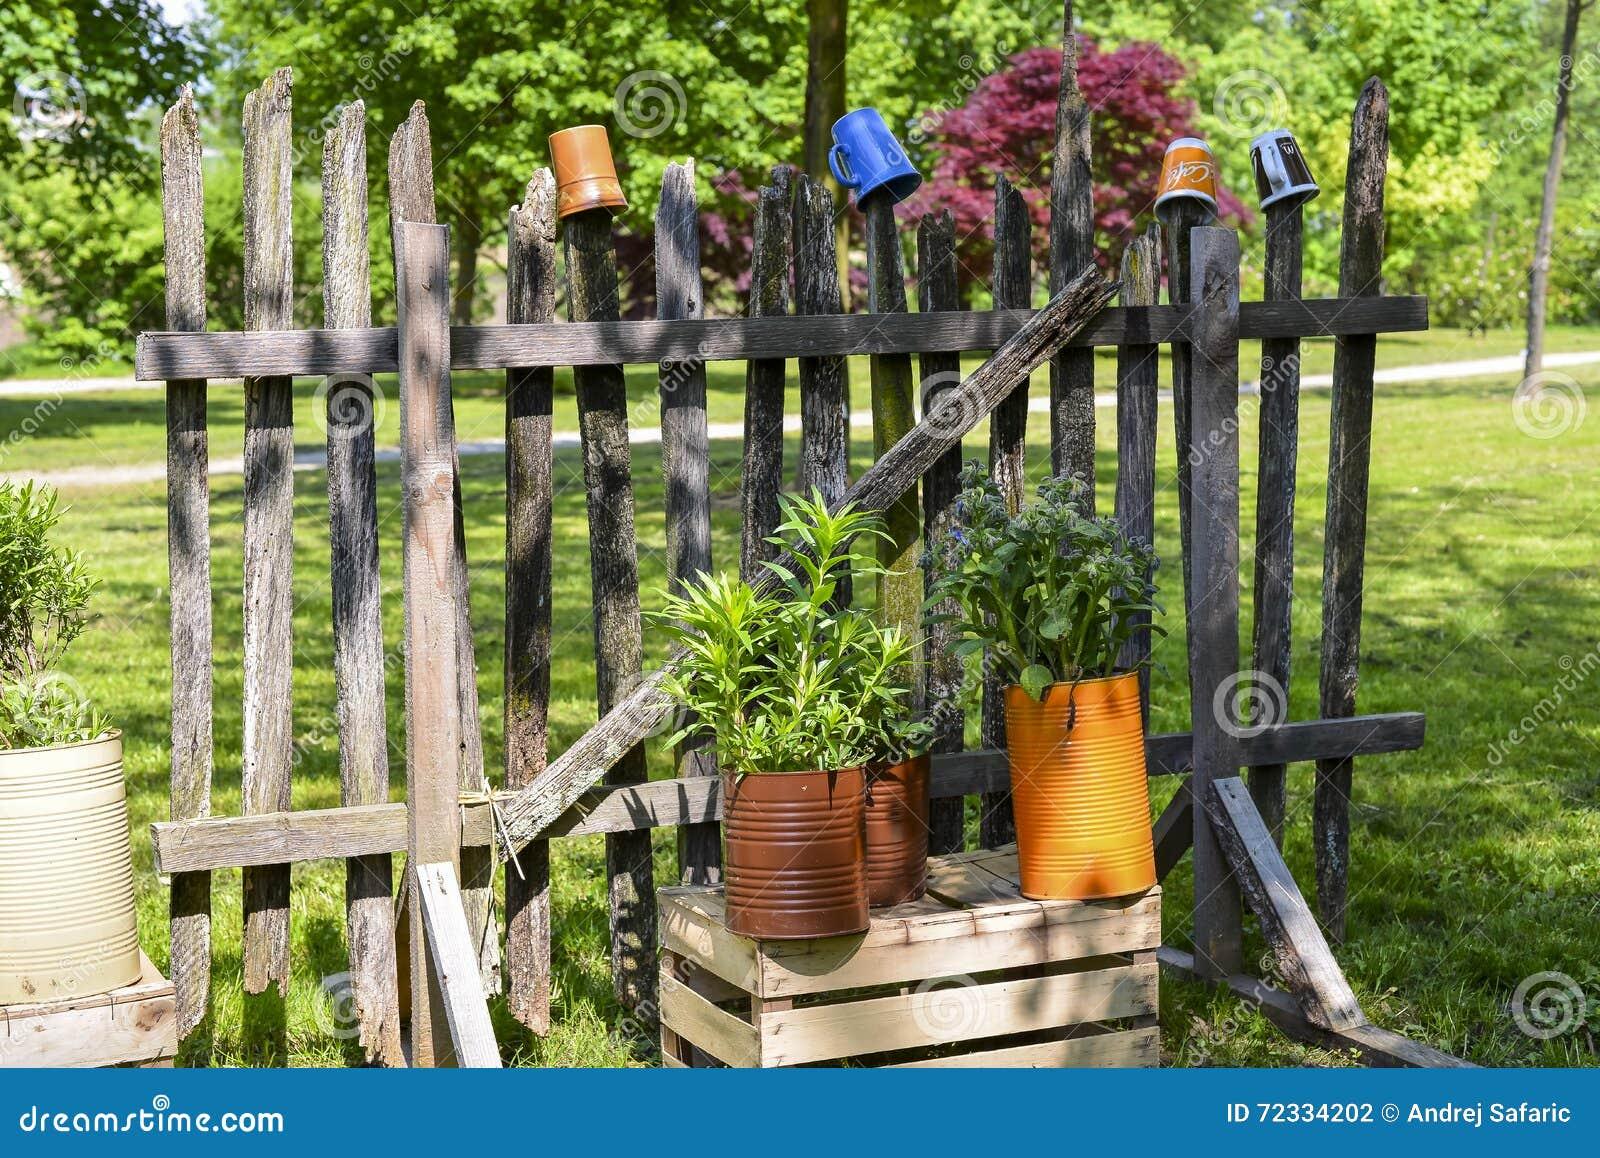 Netter Zaun Stockfoto Bild Von Park Betrieb Lustig 72334202